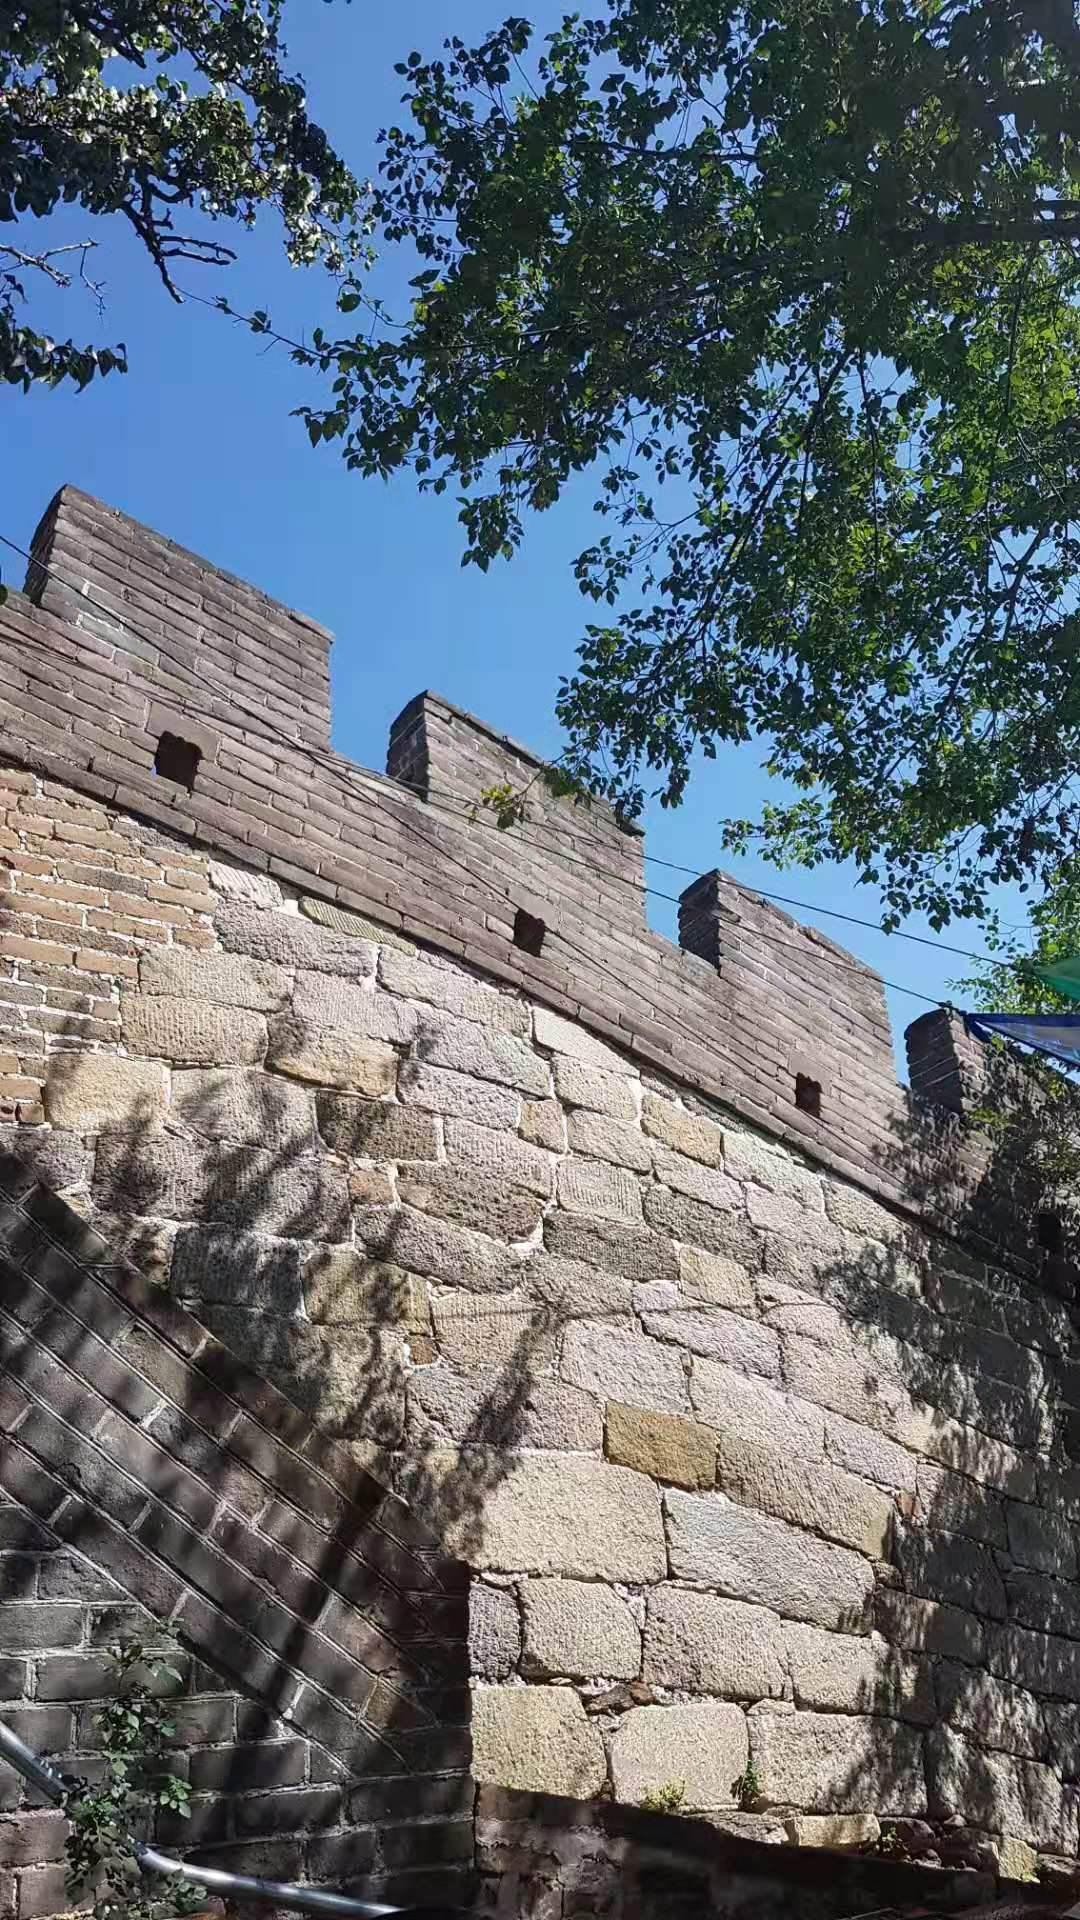 kineski zid veliki kina